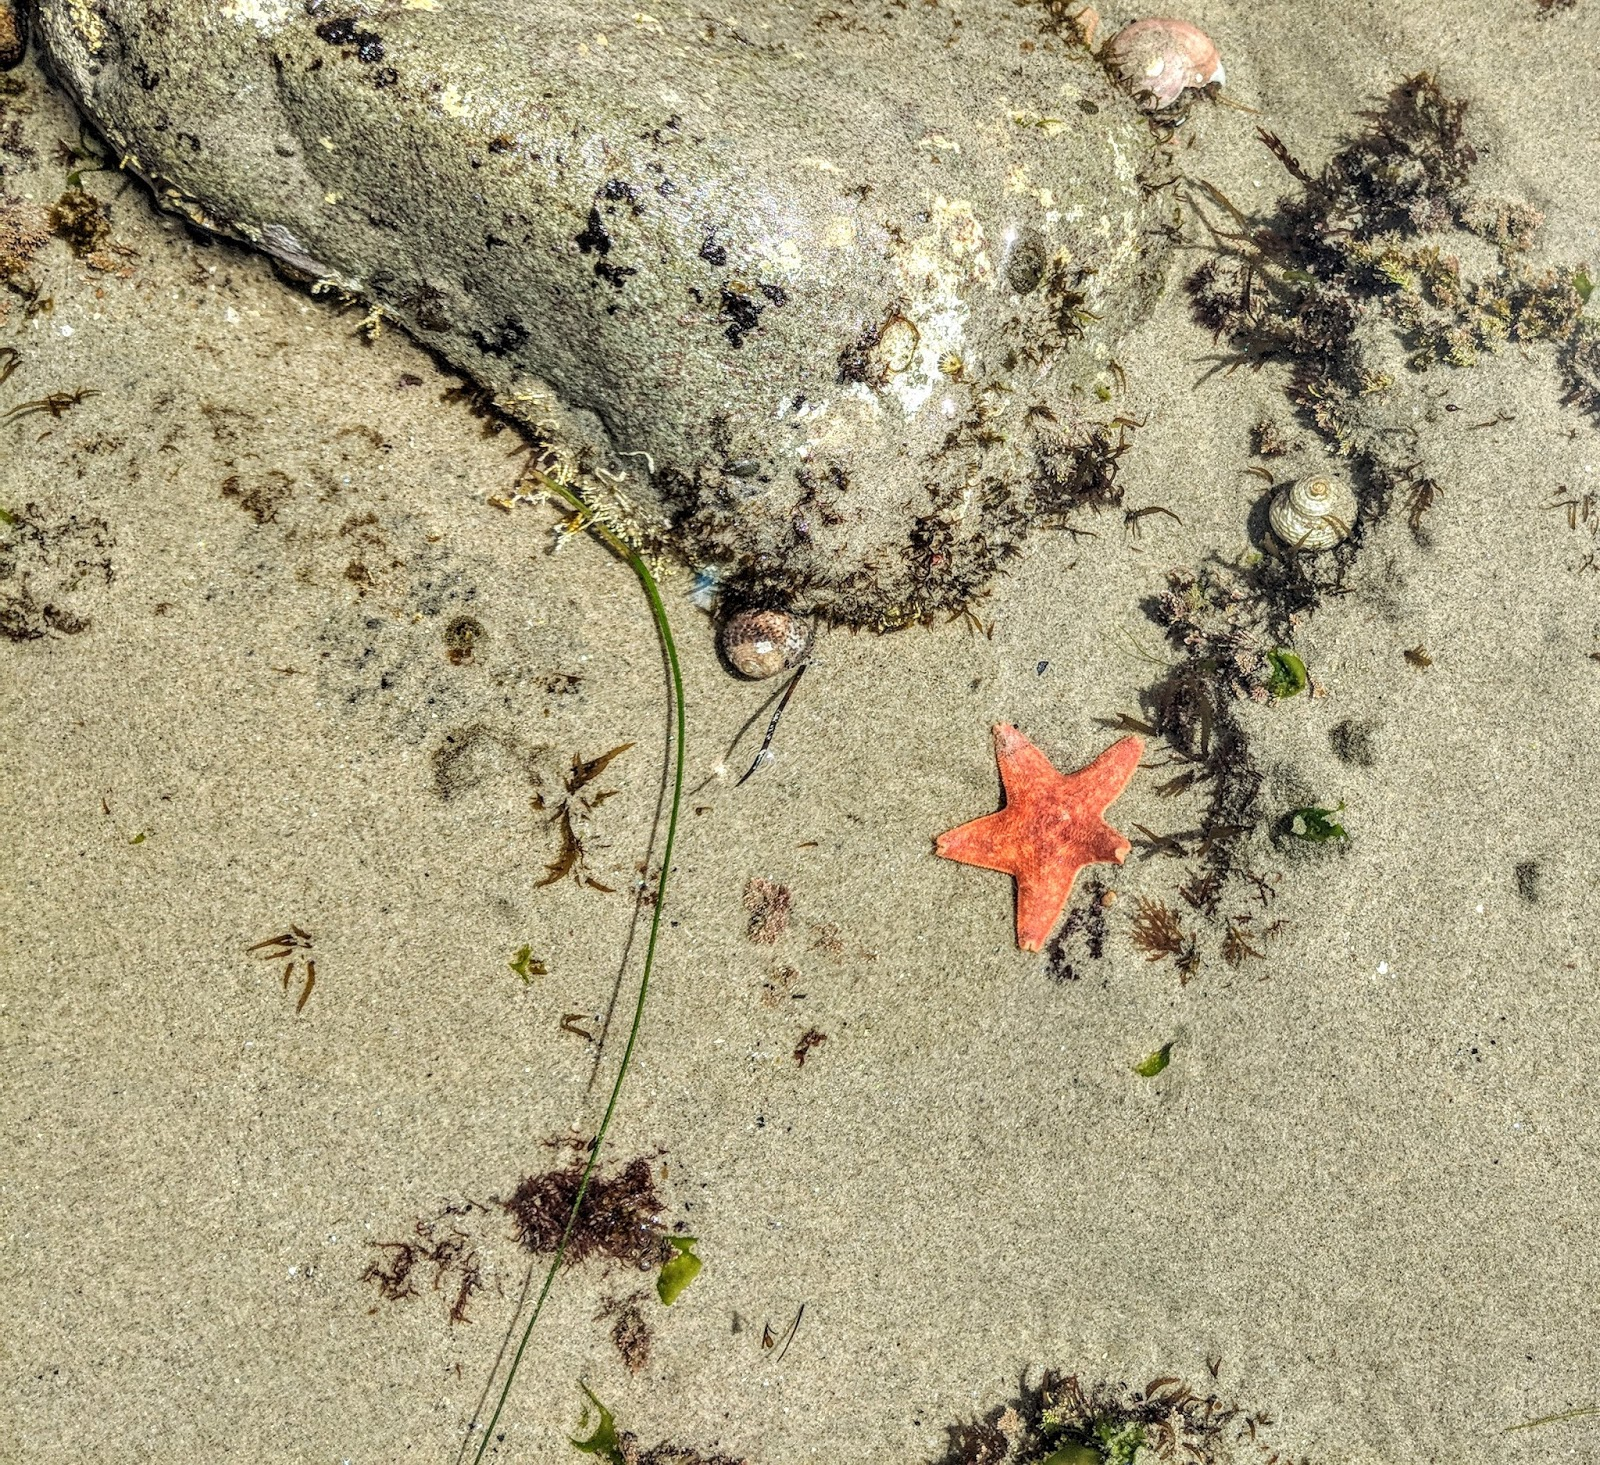 Bright orange starfish from pacific ocean at topanga beach in malibu california los angeles sealife saltlife hermit crab ocean beach coast crab hunting blogger travel blog